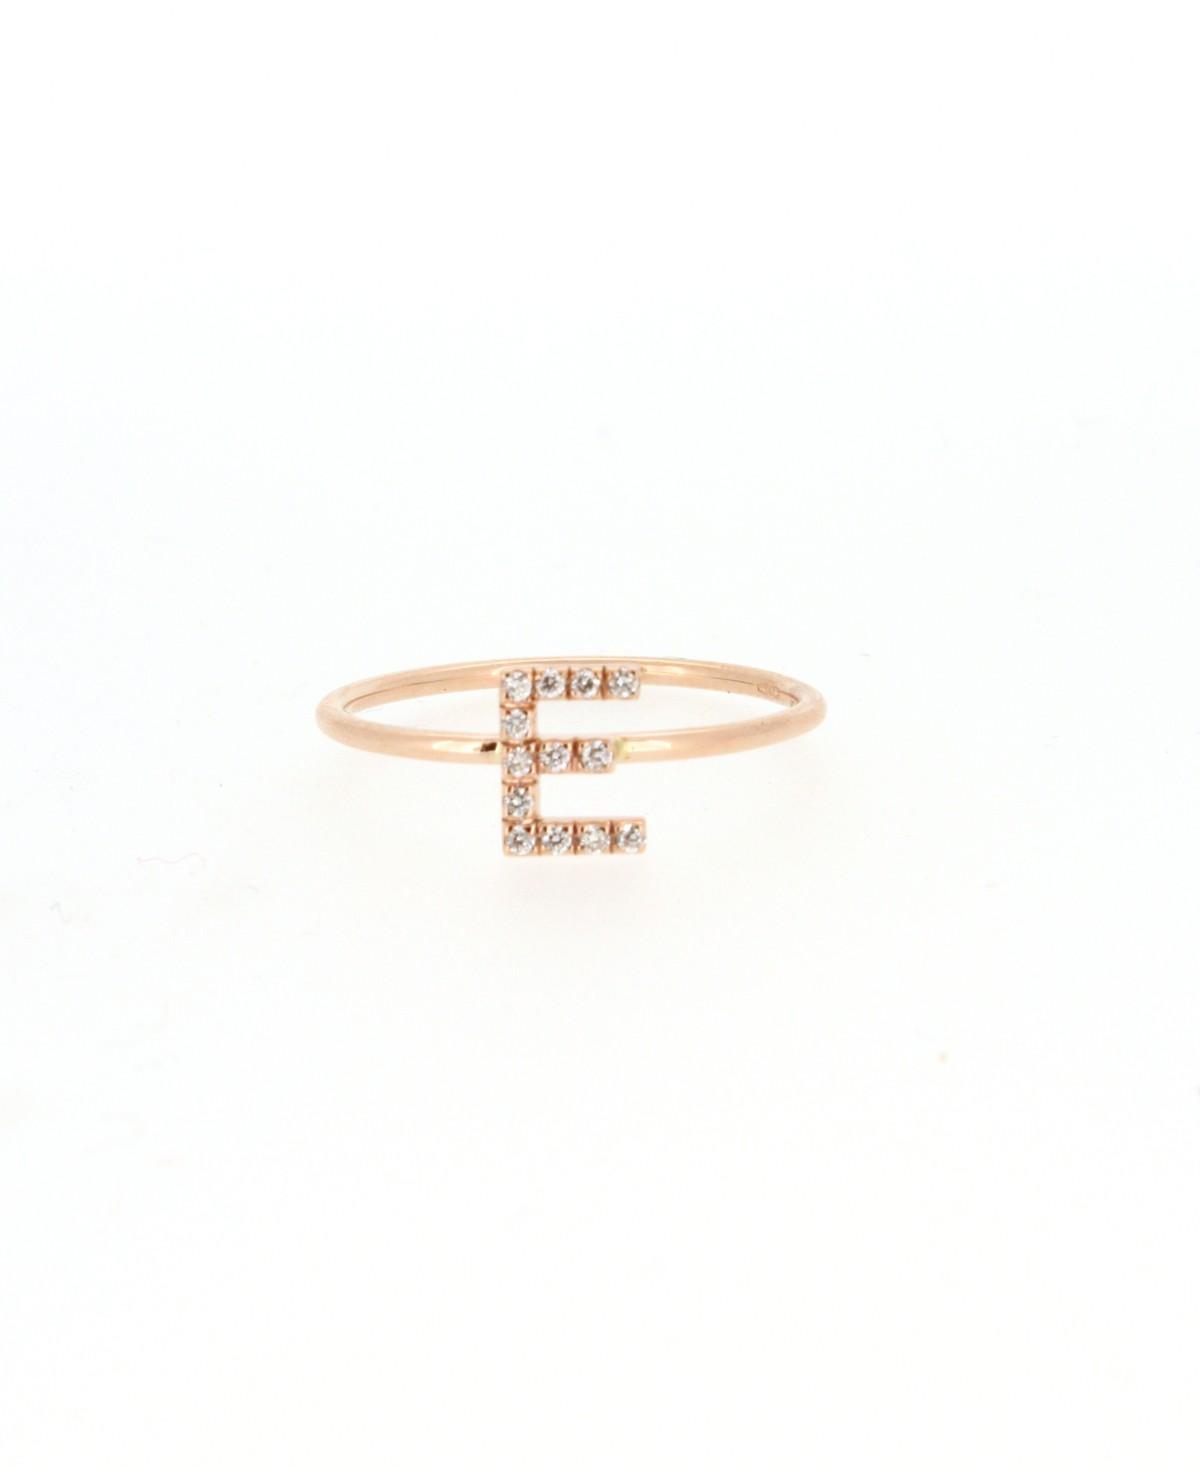 Ring Buchstabe E Brillanten - GalerieVoigt - FA1781-ER001